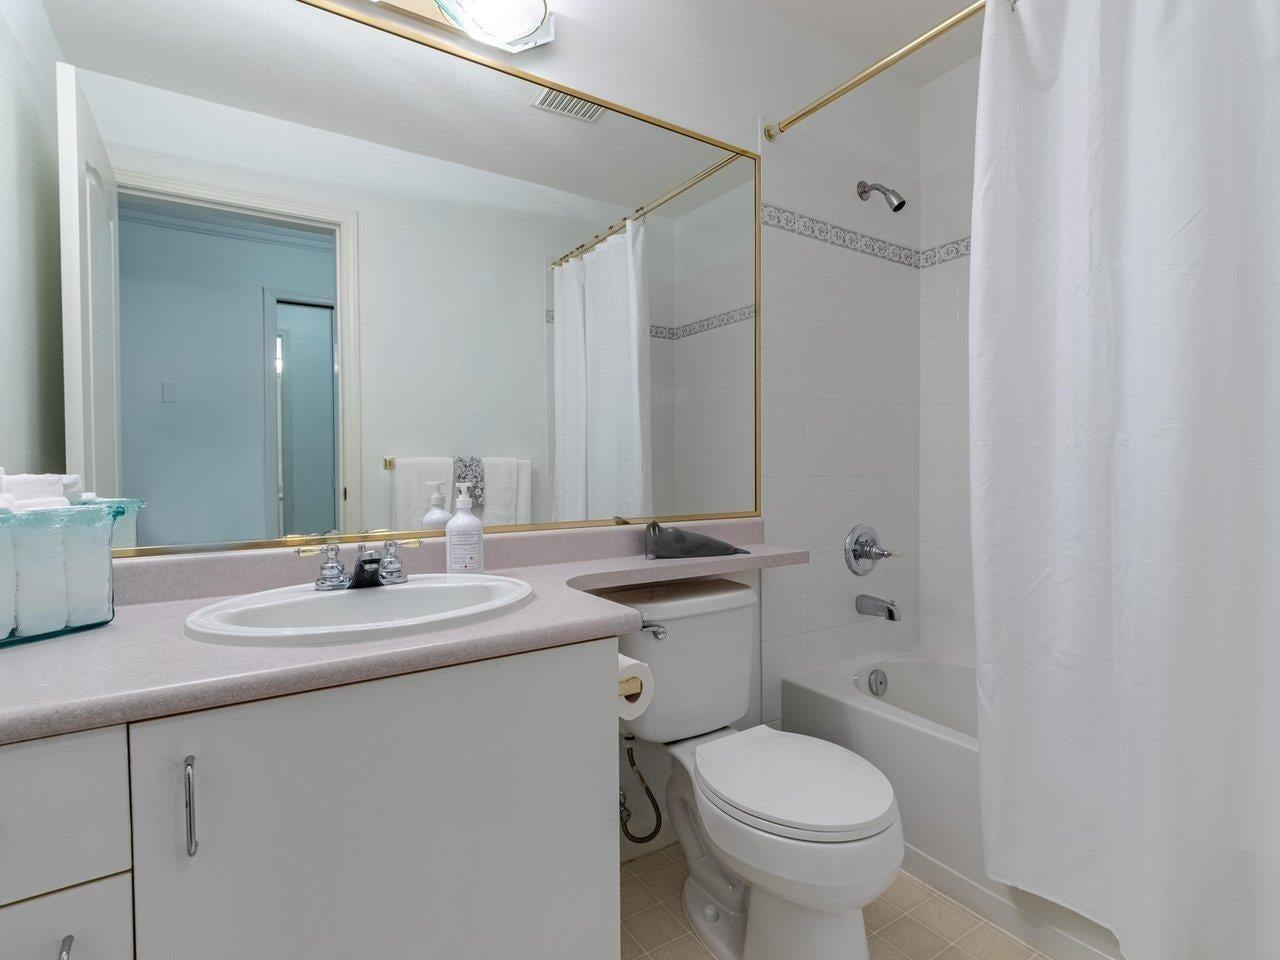 306 15298 20 AVENUE - King George Corridor Apartment/Condo for sale, 2 Bedrooms (R2625551) - #29